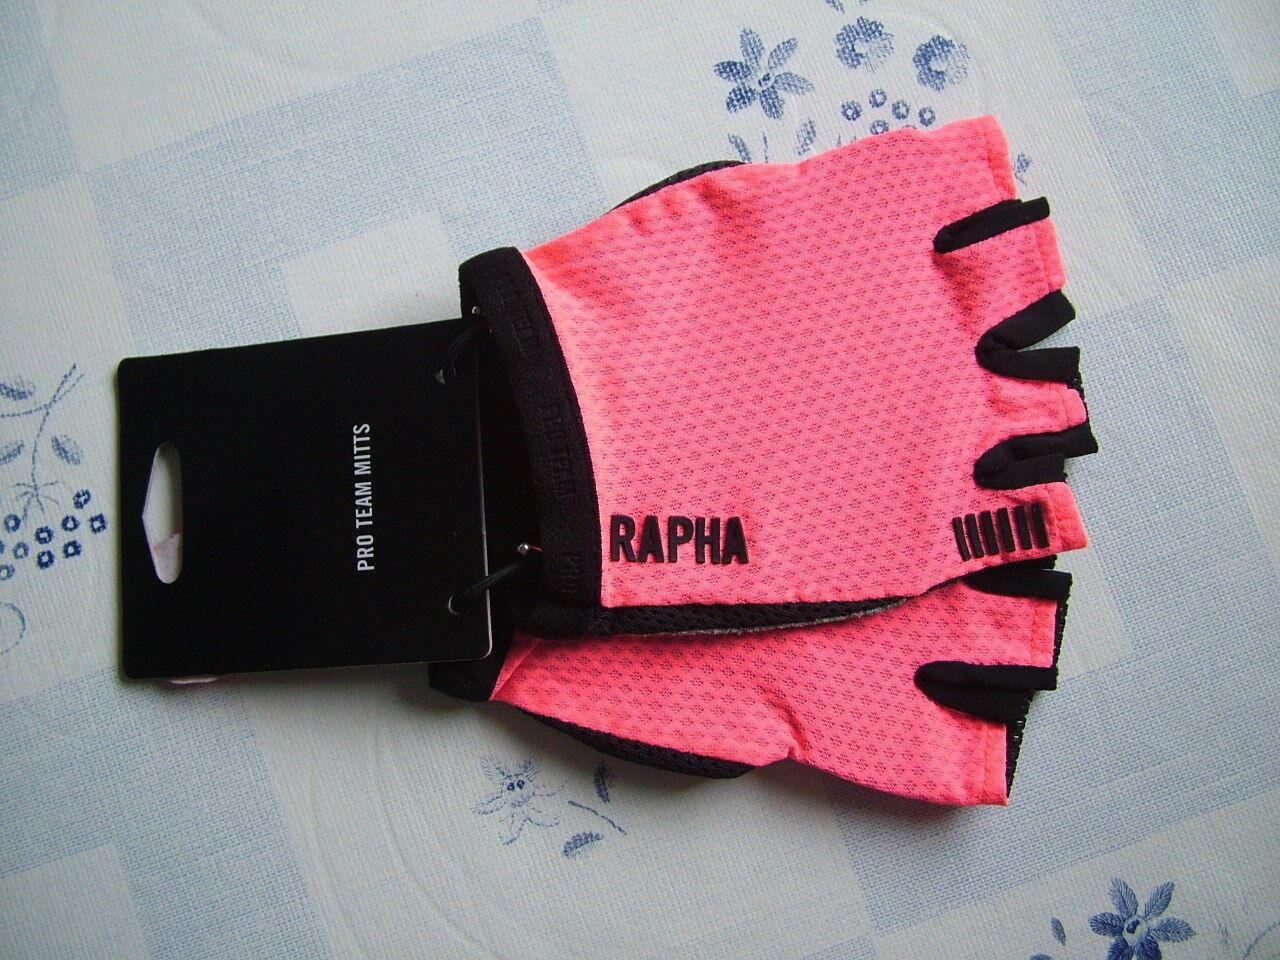 Rapha M PRO TEAM MITTS GLOVES M Rapha Rosa d3e6b3